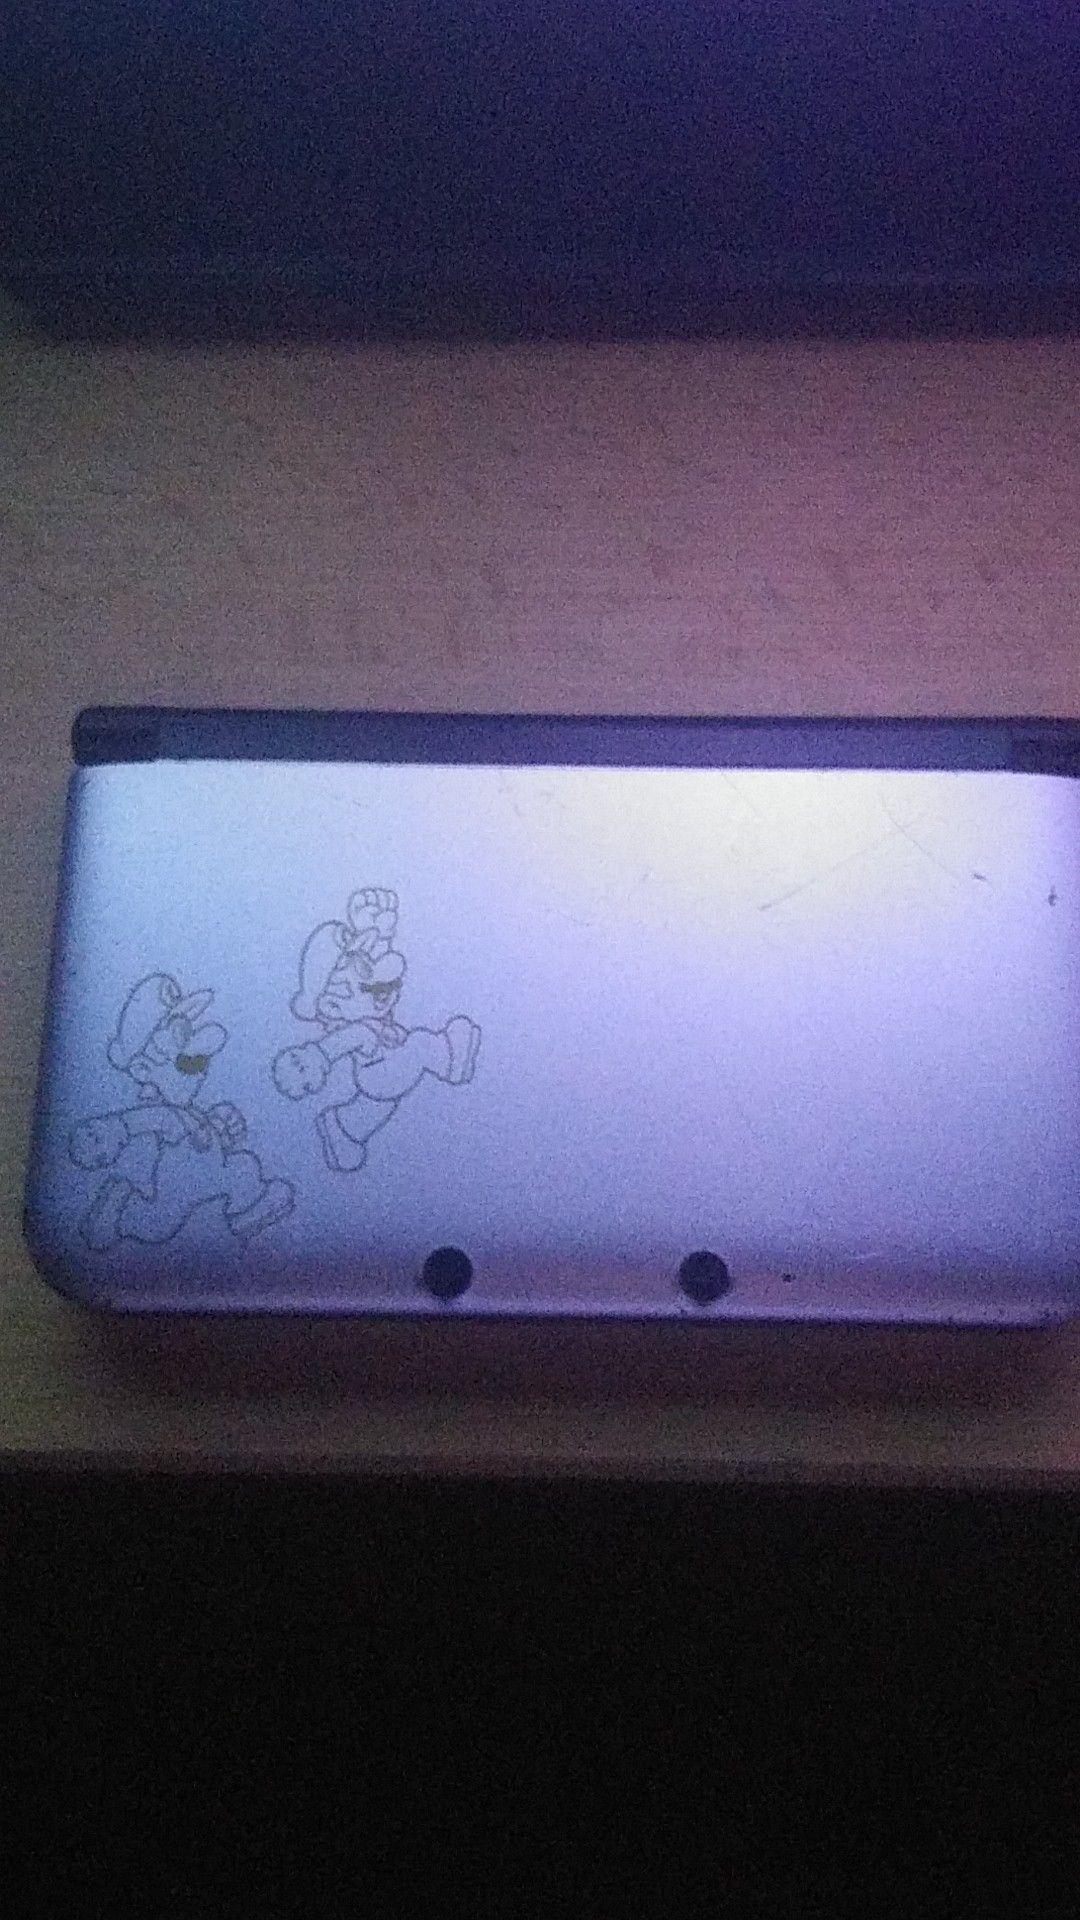 Nintendo 3ds XL Year of Luigi Edition